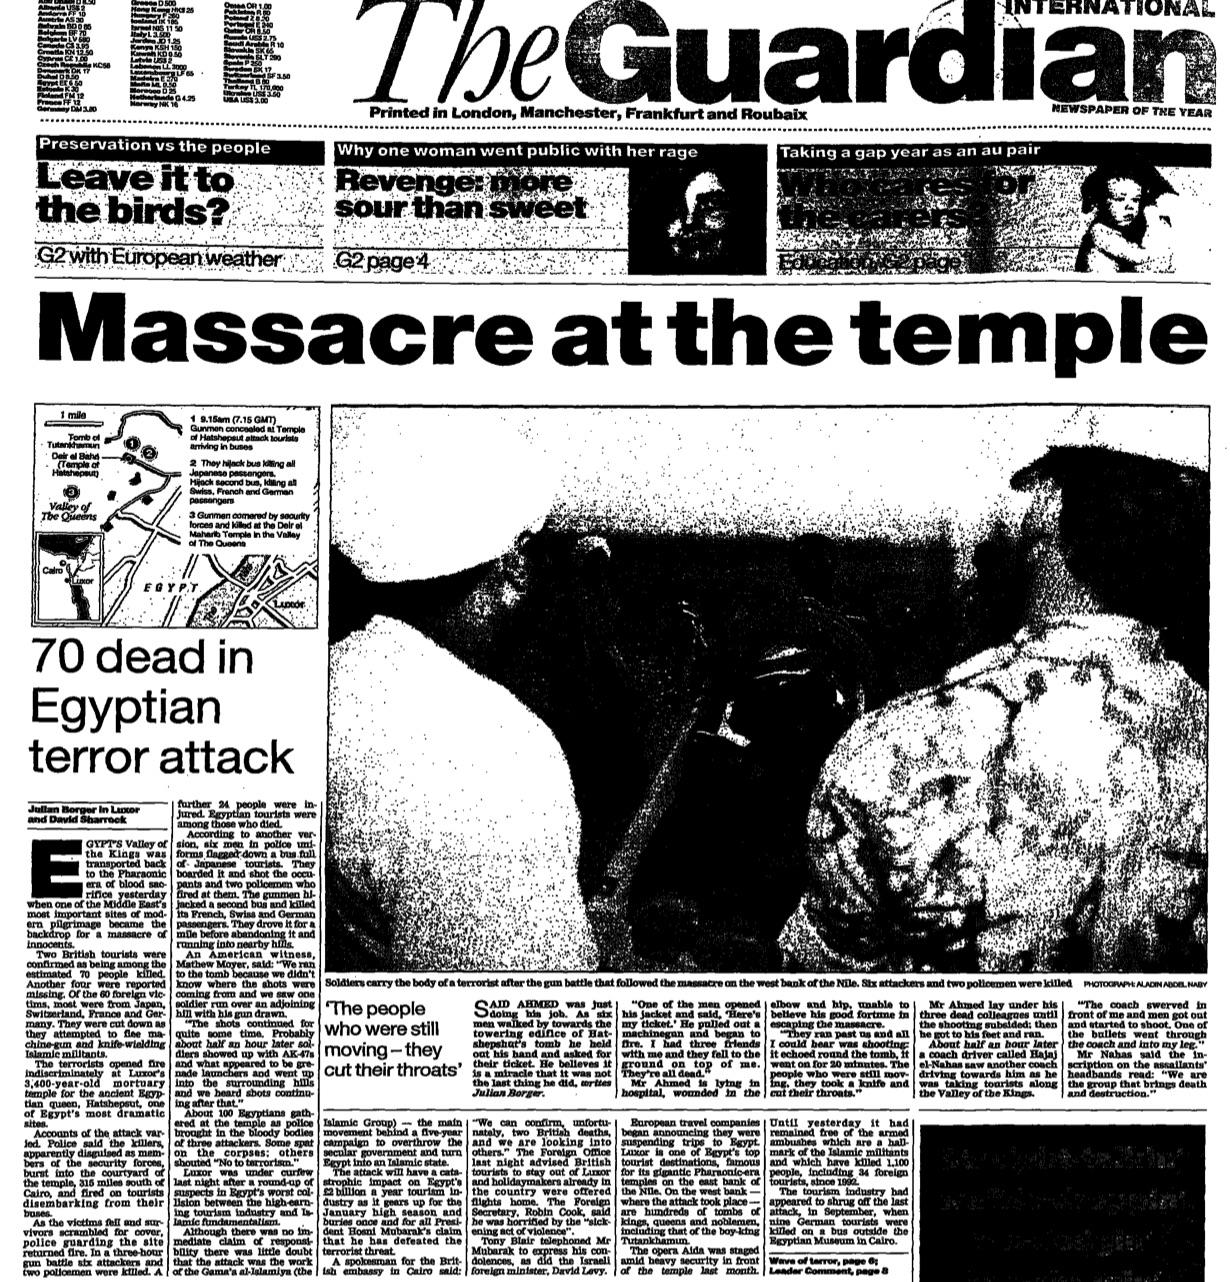 The Guardian, November 18, 1997